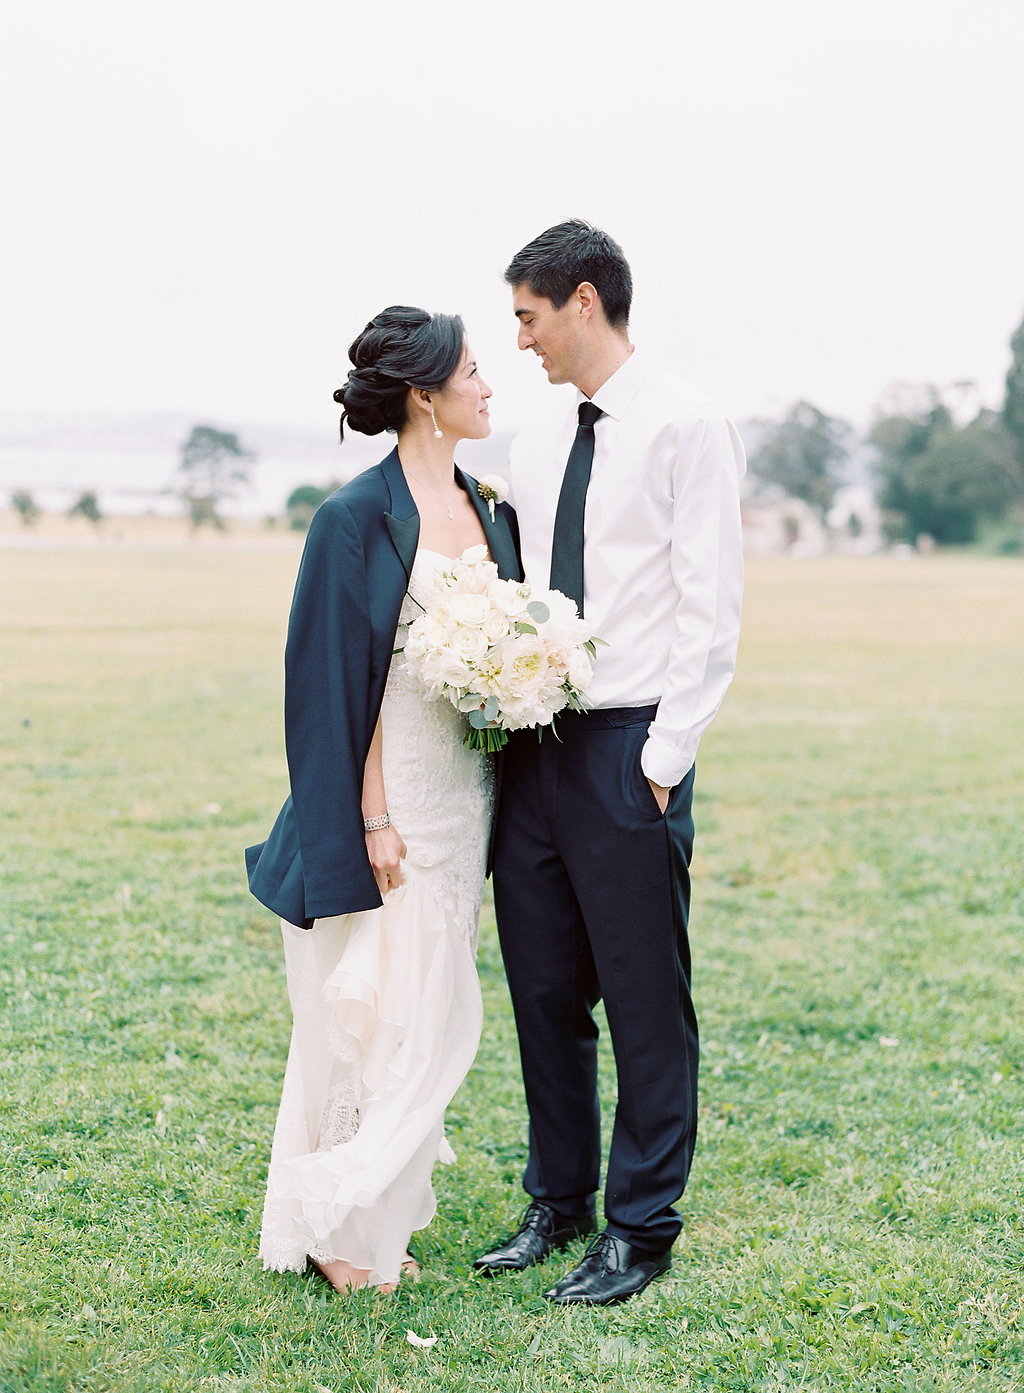 Cavallo-Point-Wedding-San-Francisco- Film-Photographer-201.jpg